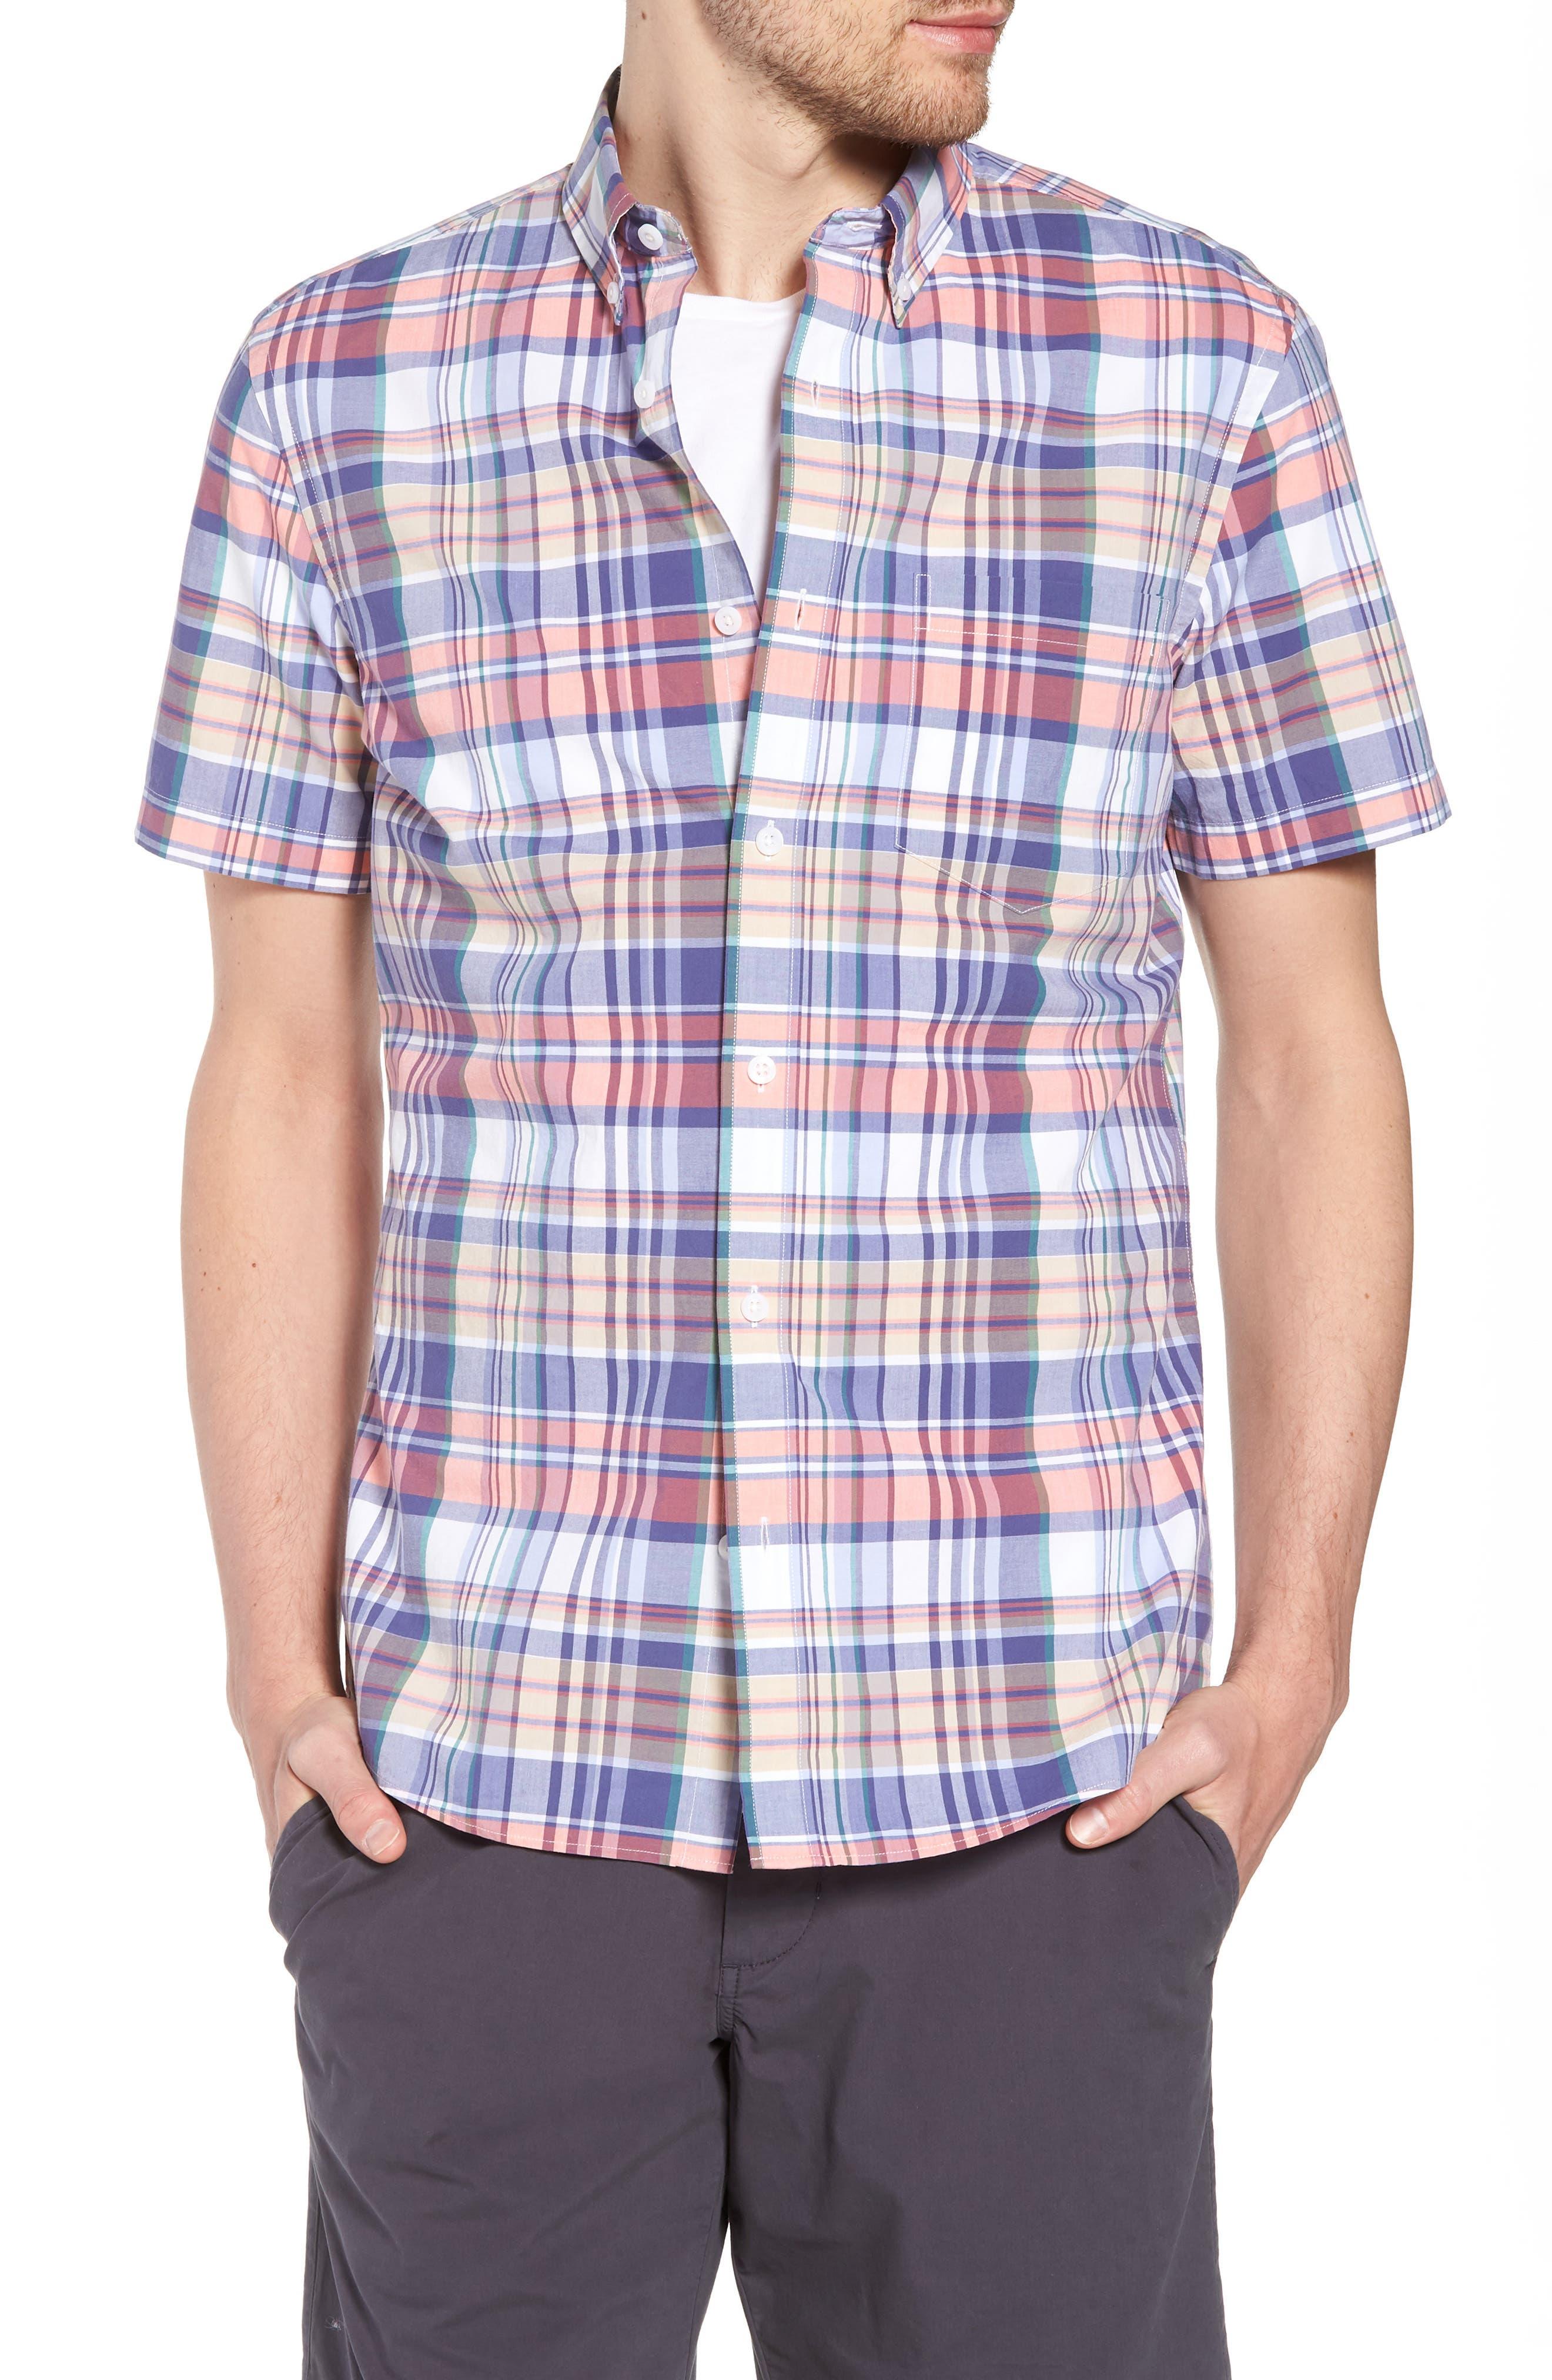 Trim Fit Plaid Short Sleeve Sport Shirt,                         Main,                         color, Navy Coral Multi Plaid